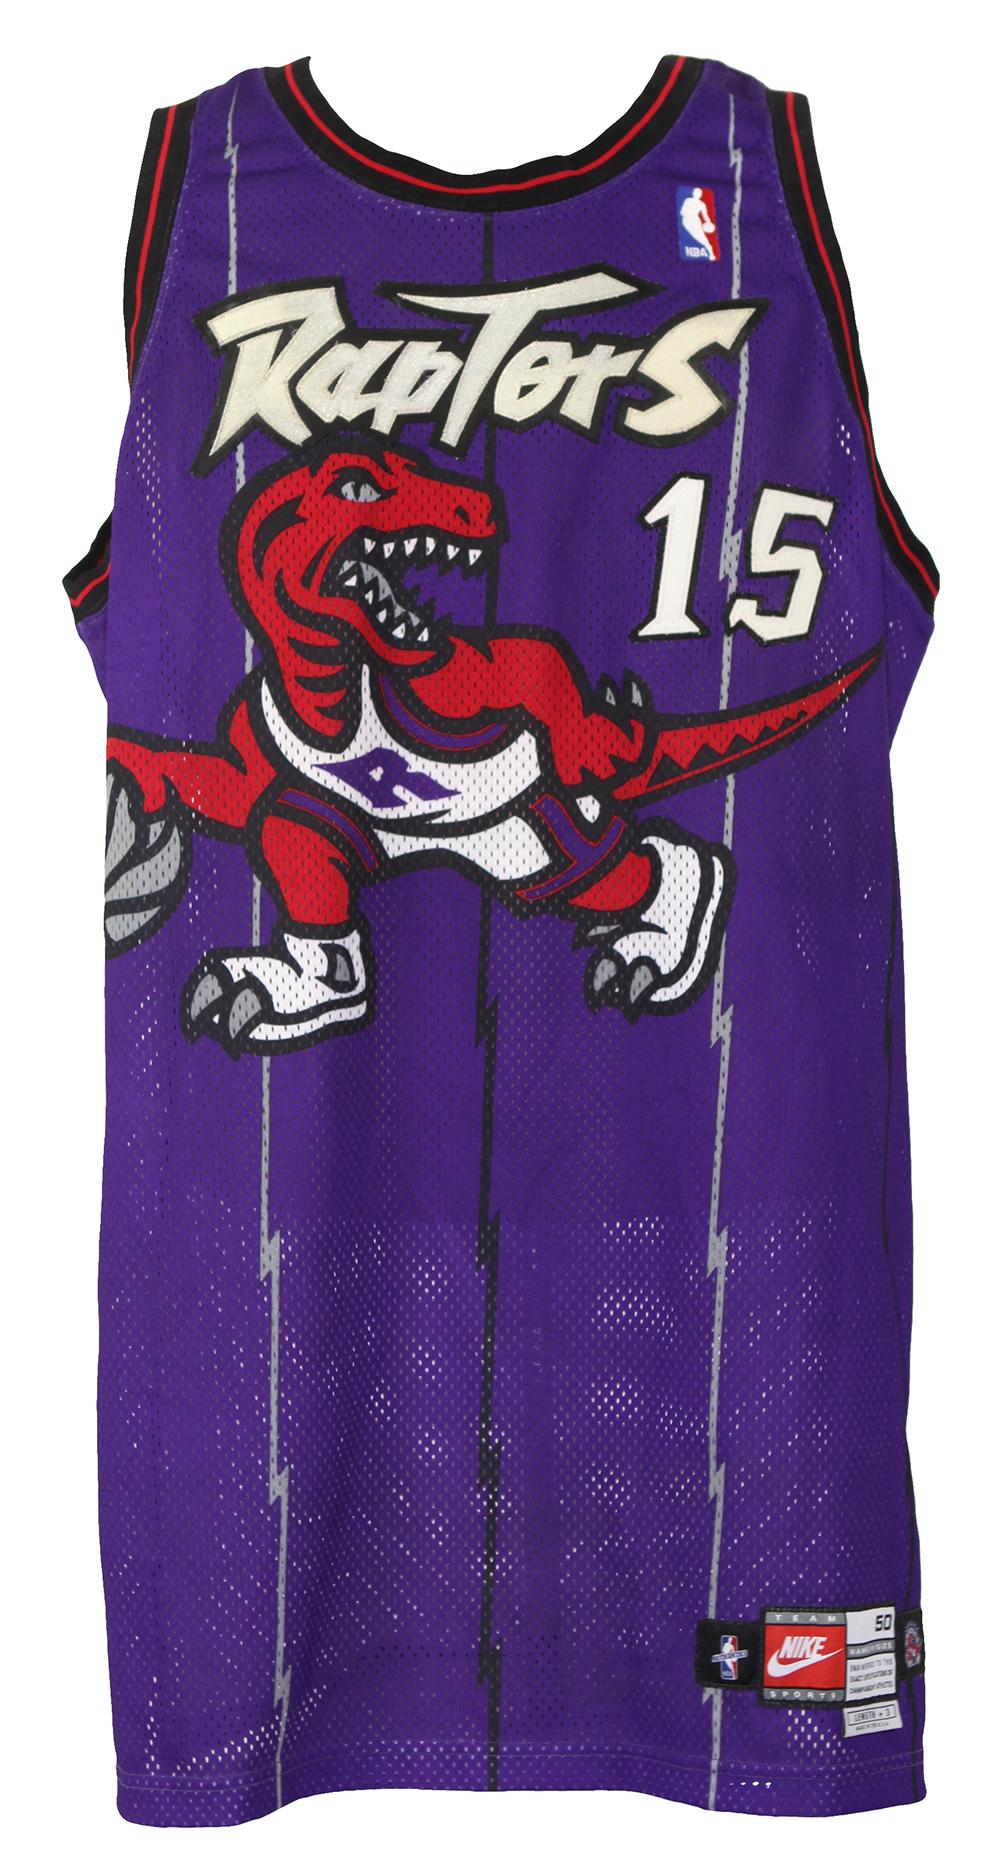 buy online 2b04b c24cc Lot Detail - 1998-99 Vince Carter Toronto Raptors Game Worn ...